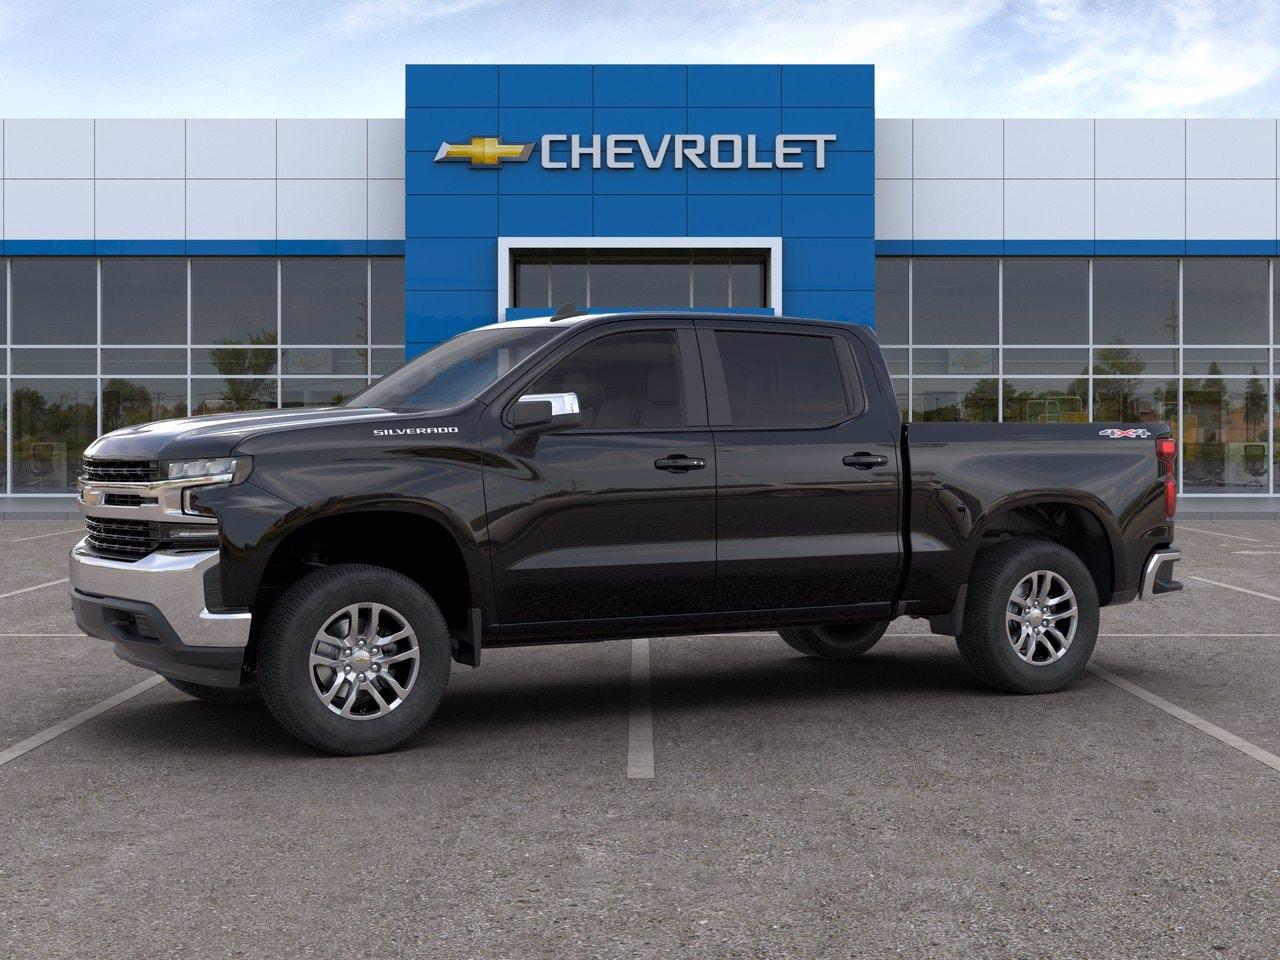 2020 Chevrolet Silverado 1500 Crew Cab 4x4, Pickup #C201419 - photo 3